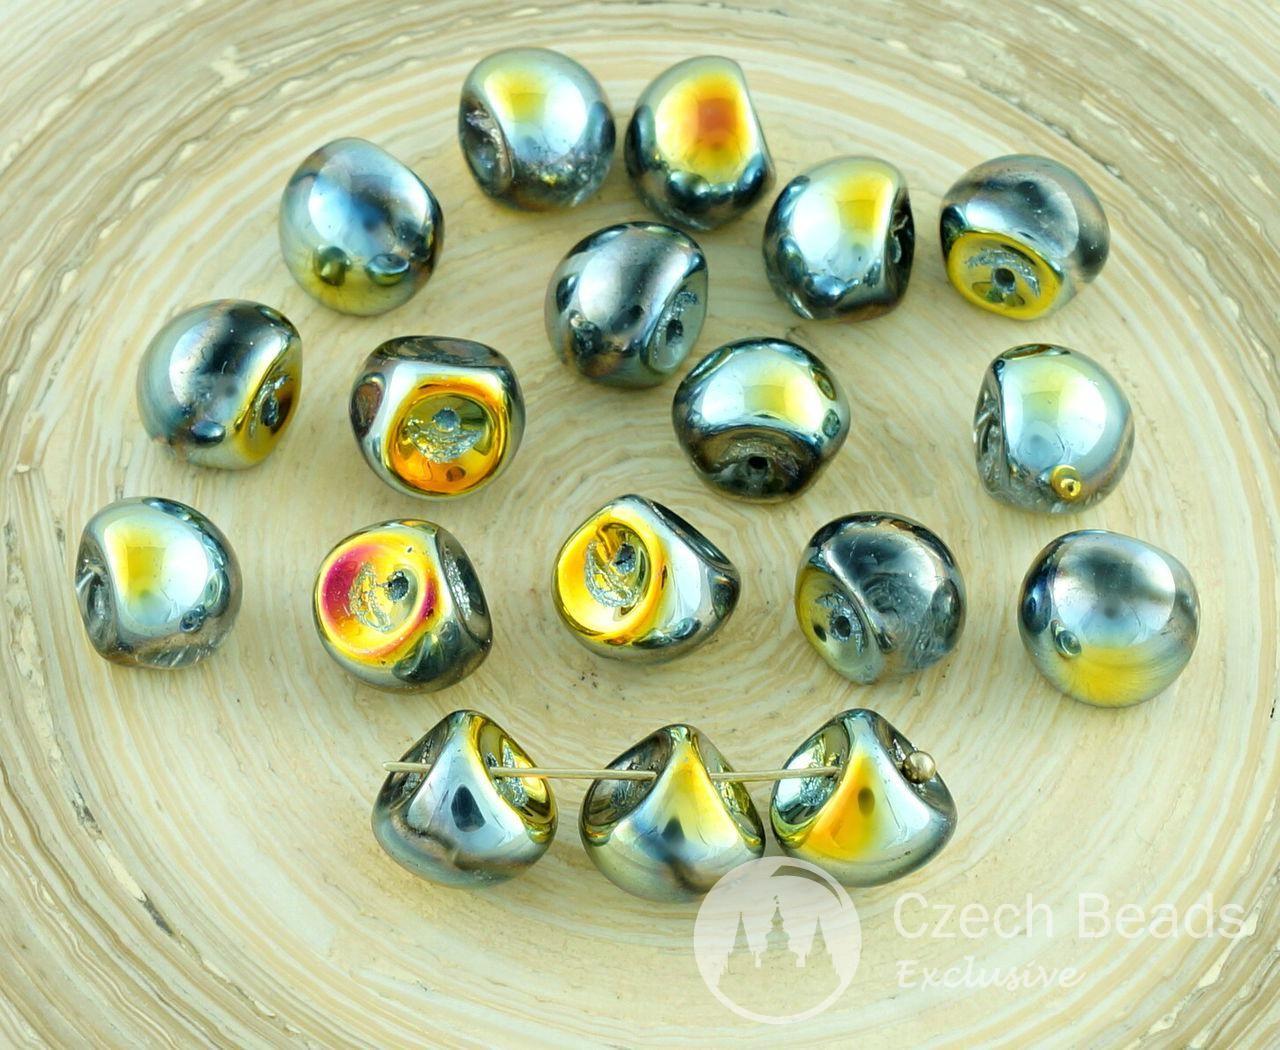 12pcs Picasso Large Mushroom Button Czech Glass Beads 9mm x 8mm